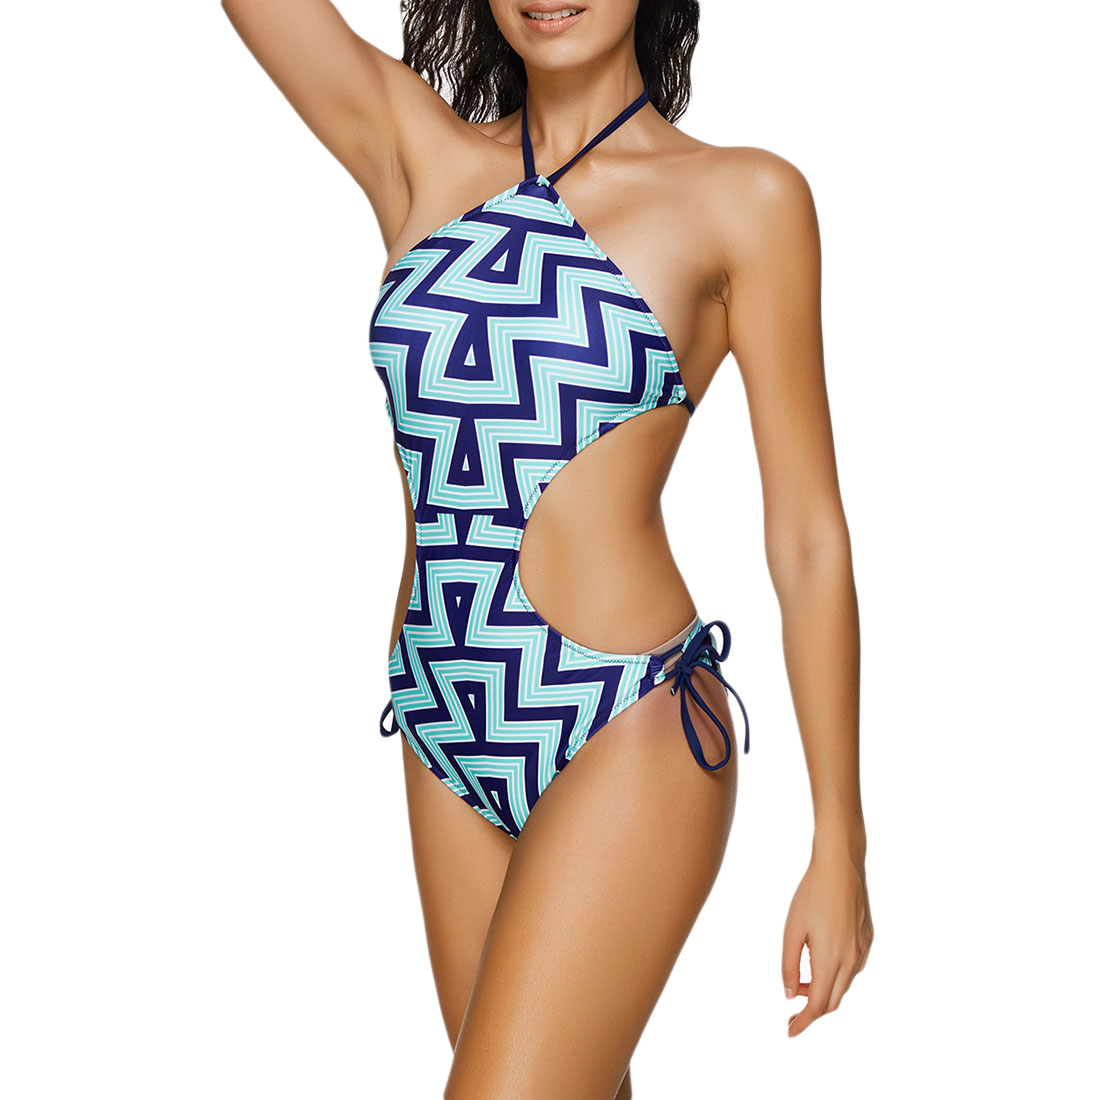 ab9ebbd7f Bikini 2018 Plus Size One Piece Swimsuit Women Geometric Swimwear Sexy  Backless Roupa de banho Hollow Out Beach Wear Swim Suit-in Body Suits from  Sports ...